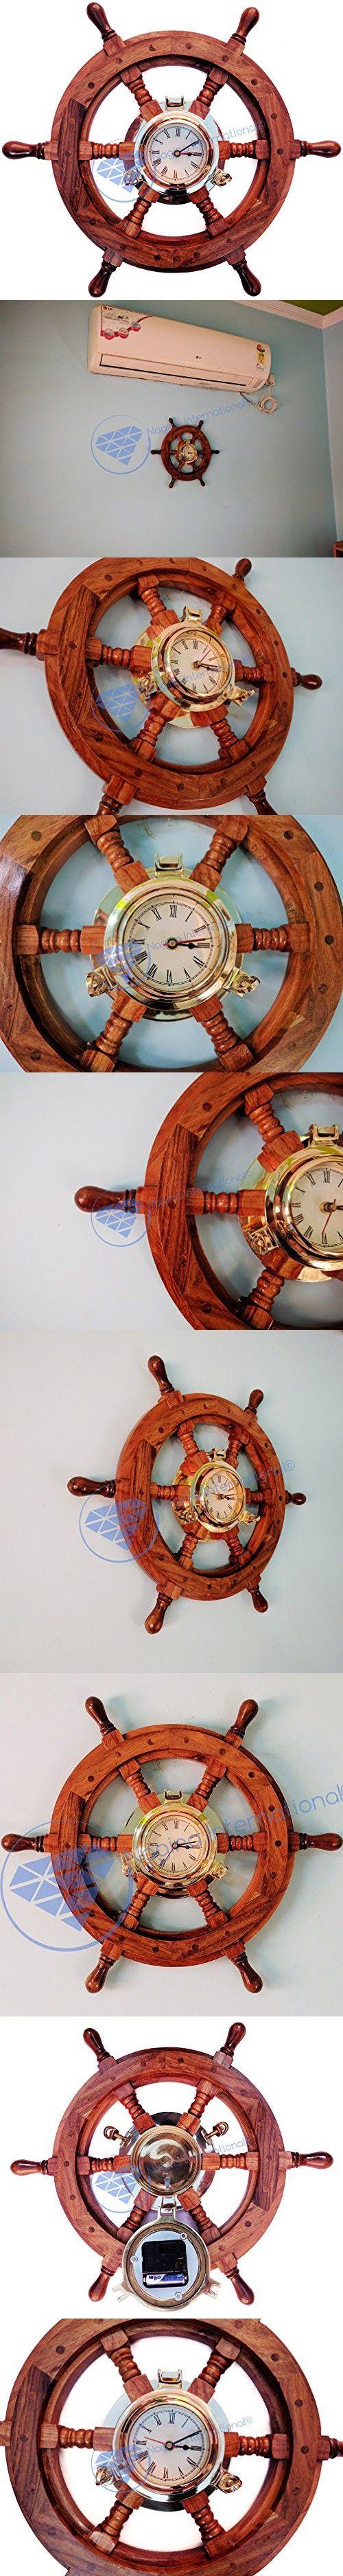 Sailor's Premium Home Decor Time's Clock Nautical Brass Porthole Ship's Wheel   Deluxe Office Decor   Wall Decor   Birthday Gift   Christmas Black Friday   Nagina International (18 Inches)